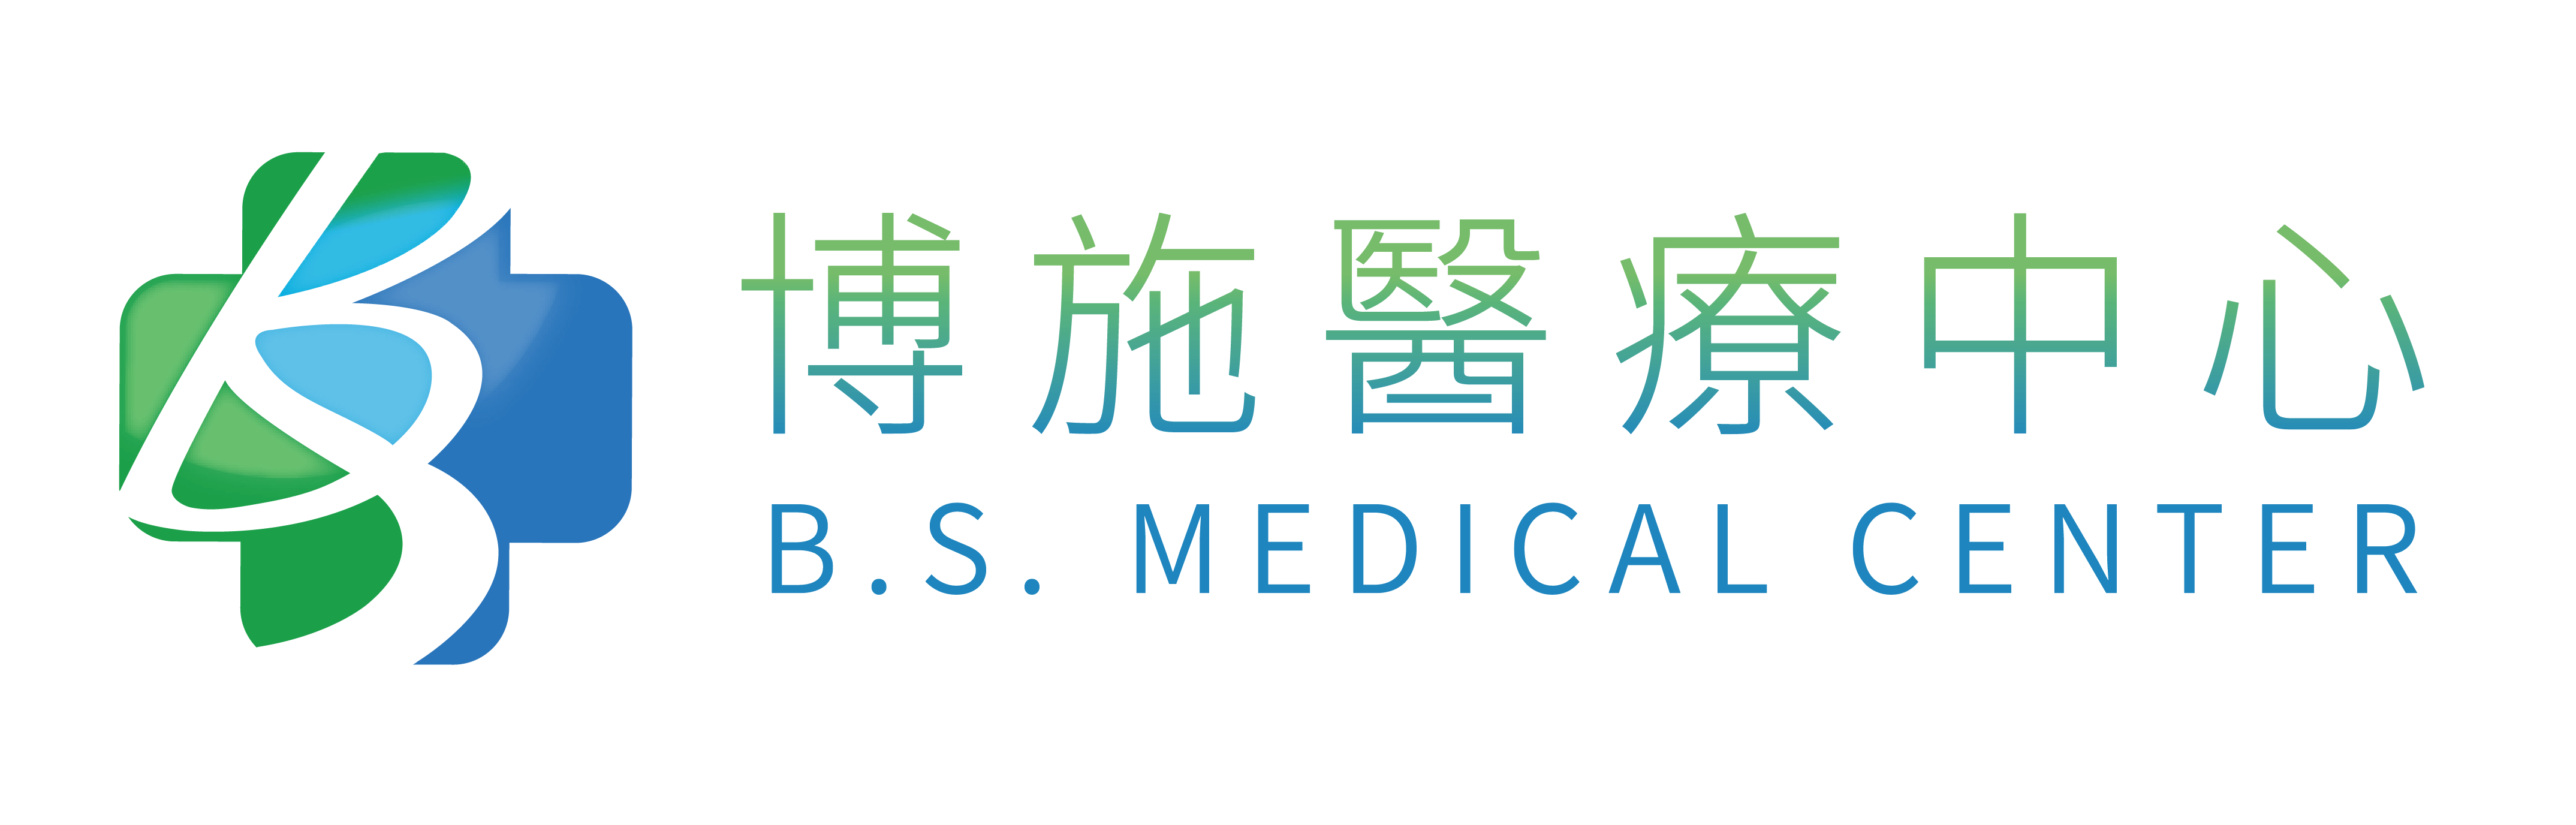 博施醫療中心 B.S.MEDICAL CENTER